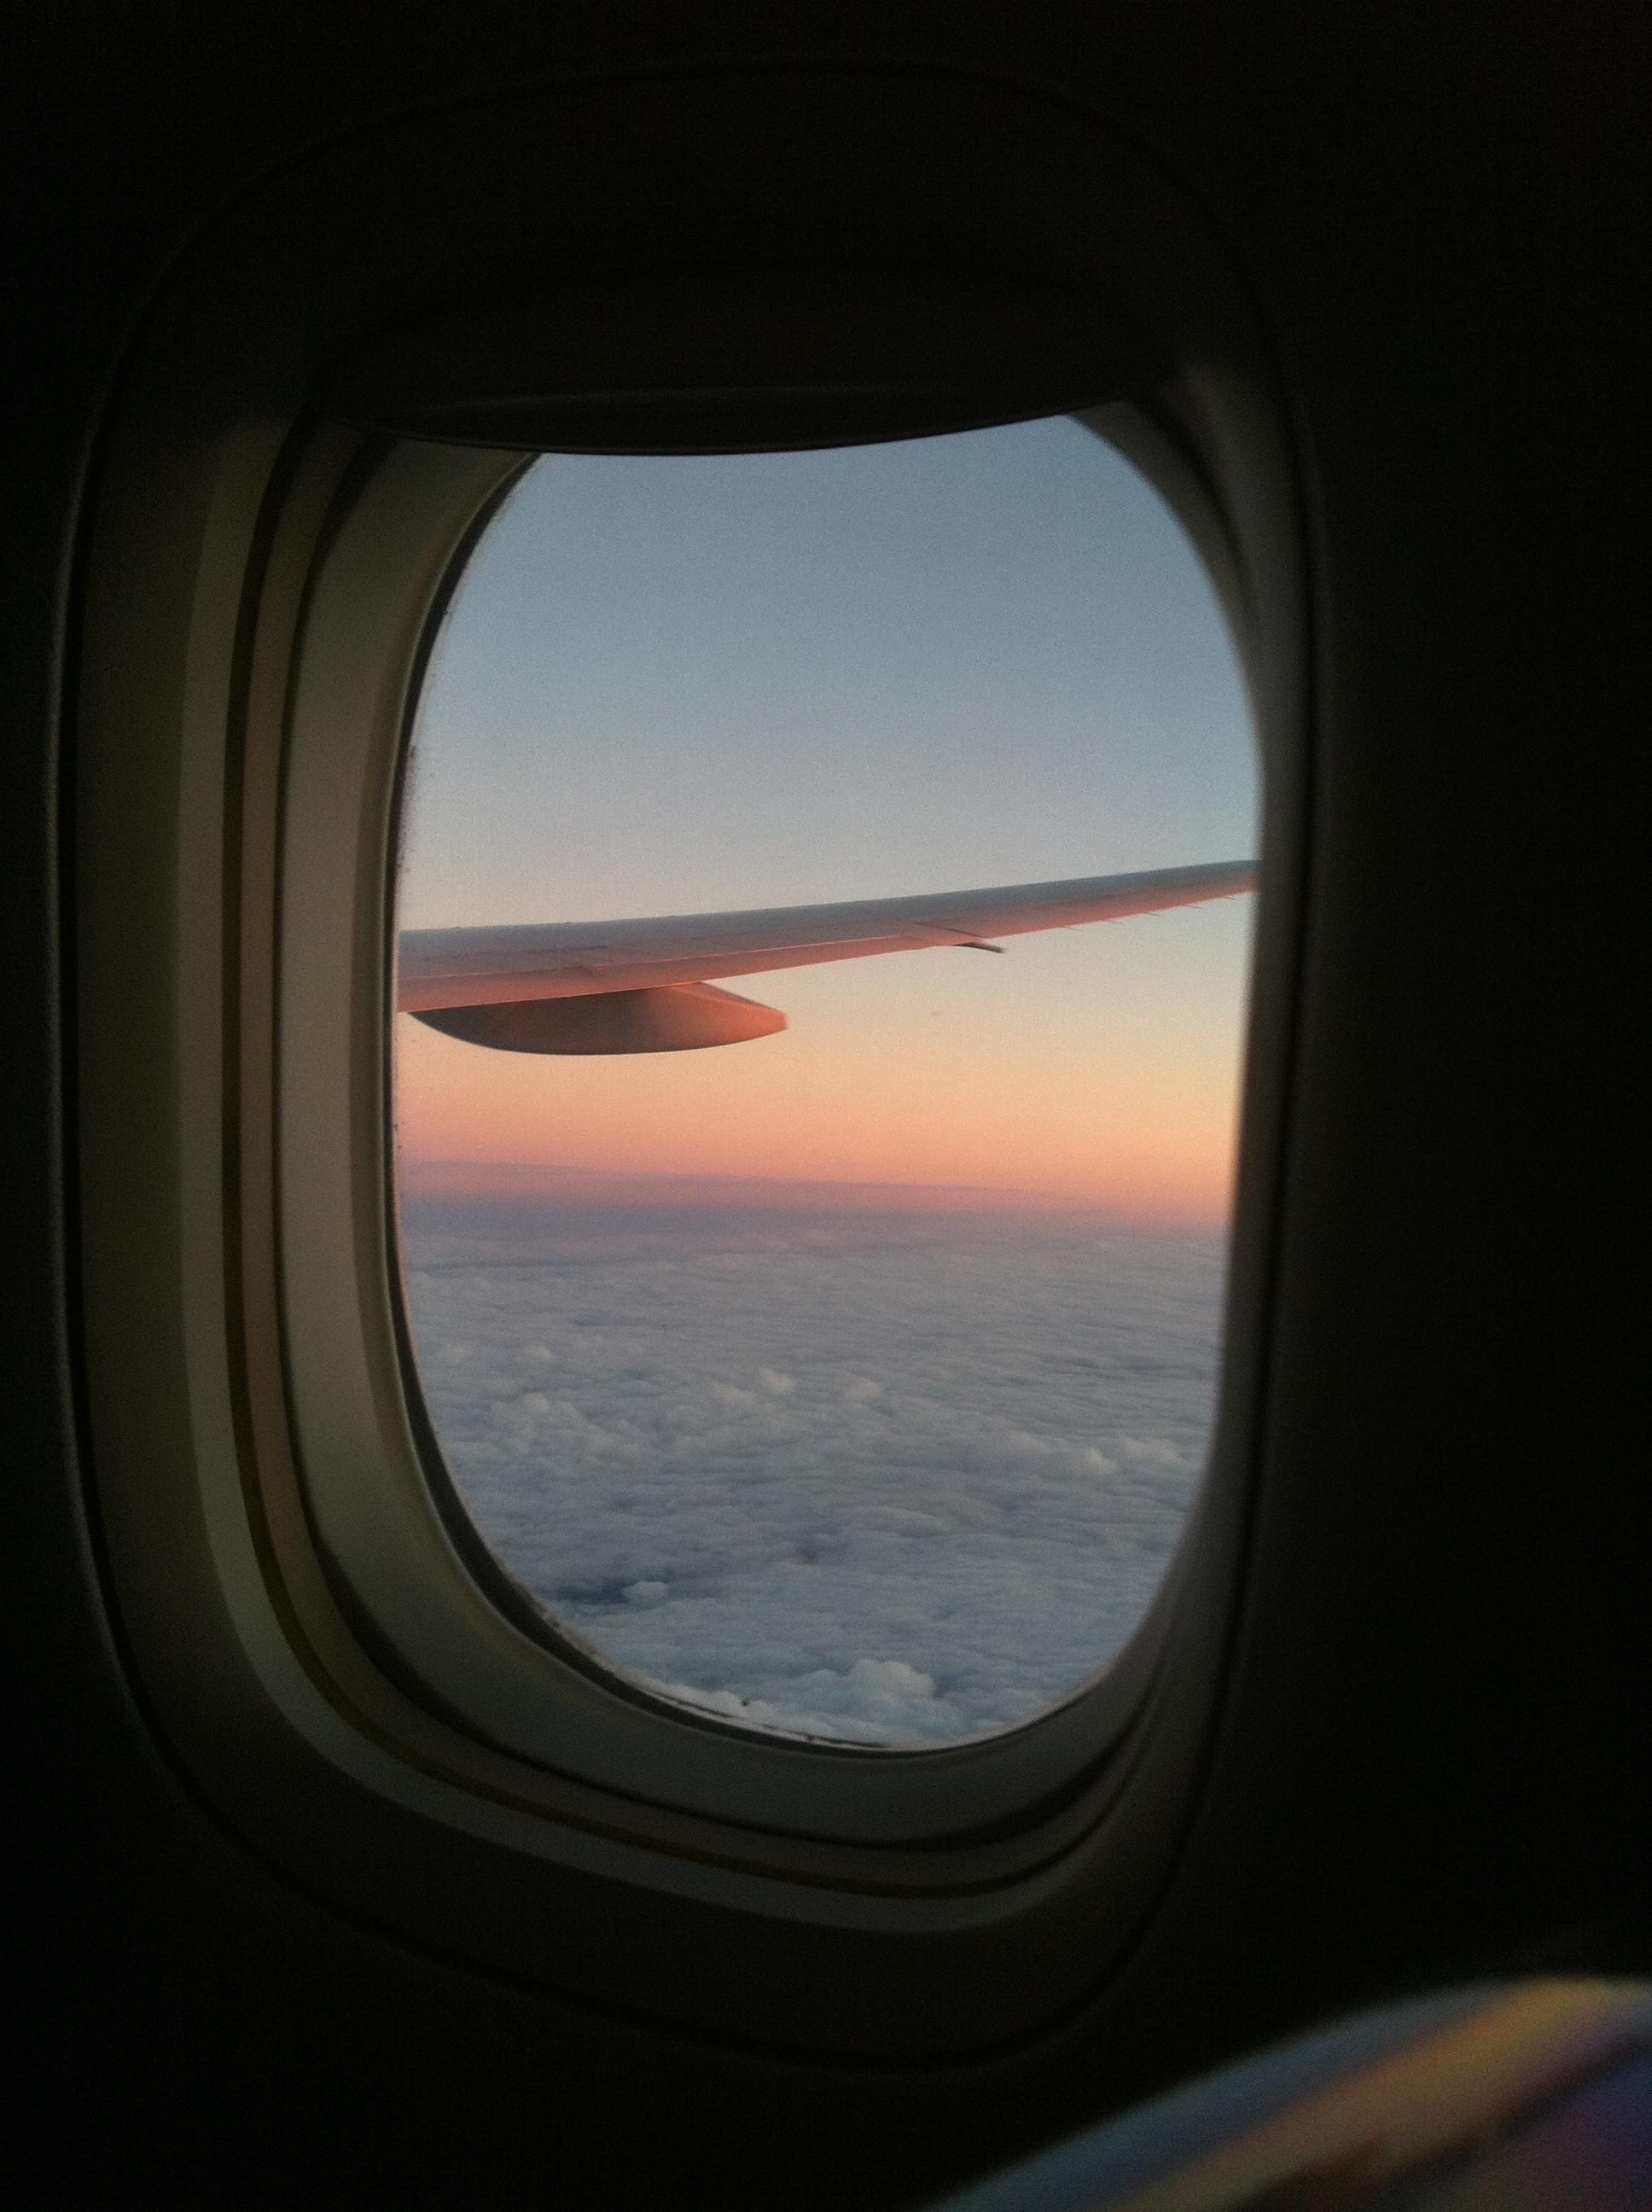 Goodbye, Japan! Until next time!